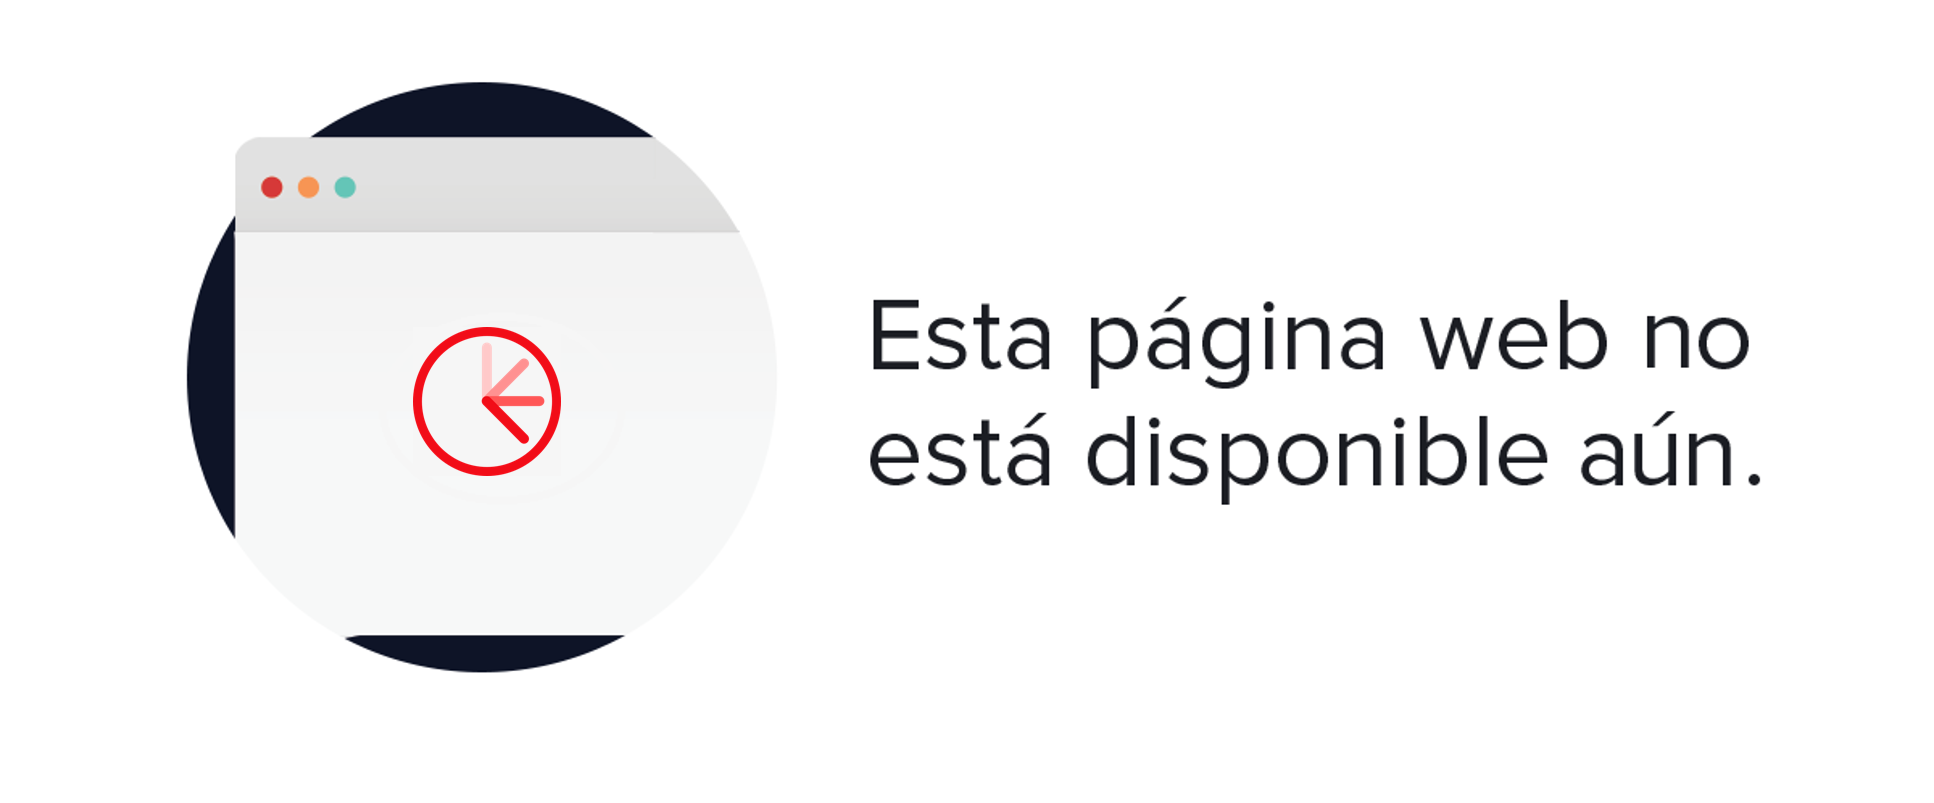 Hogan Ebano Zapatillas Deportivas Hombre 470083 - Barato - WCBDBLZ